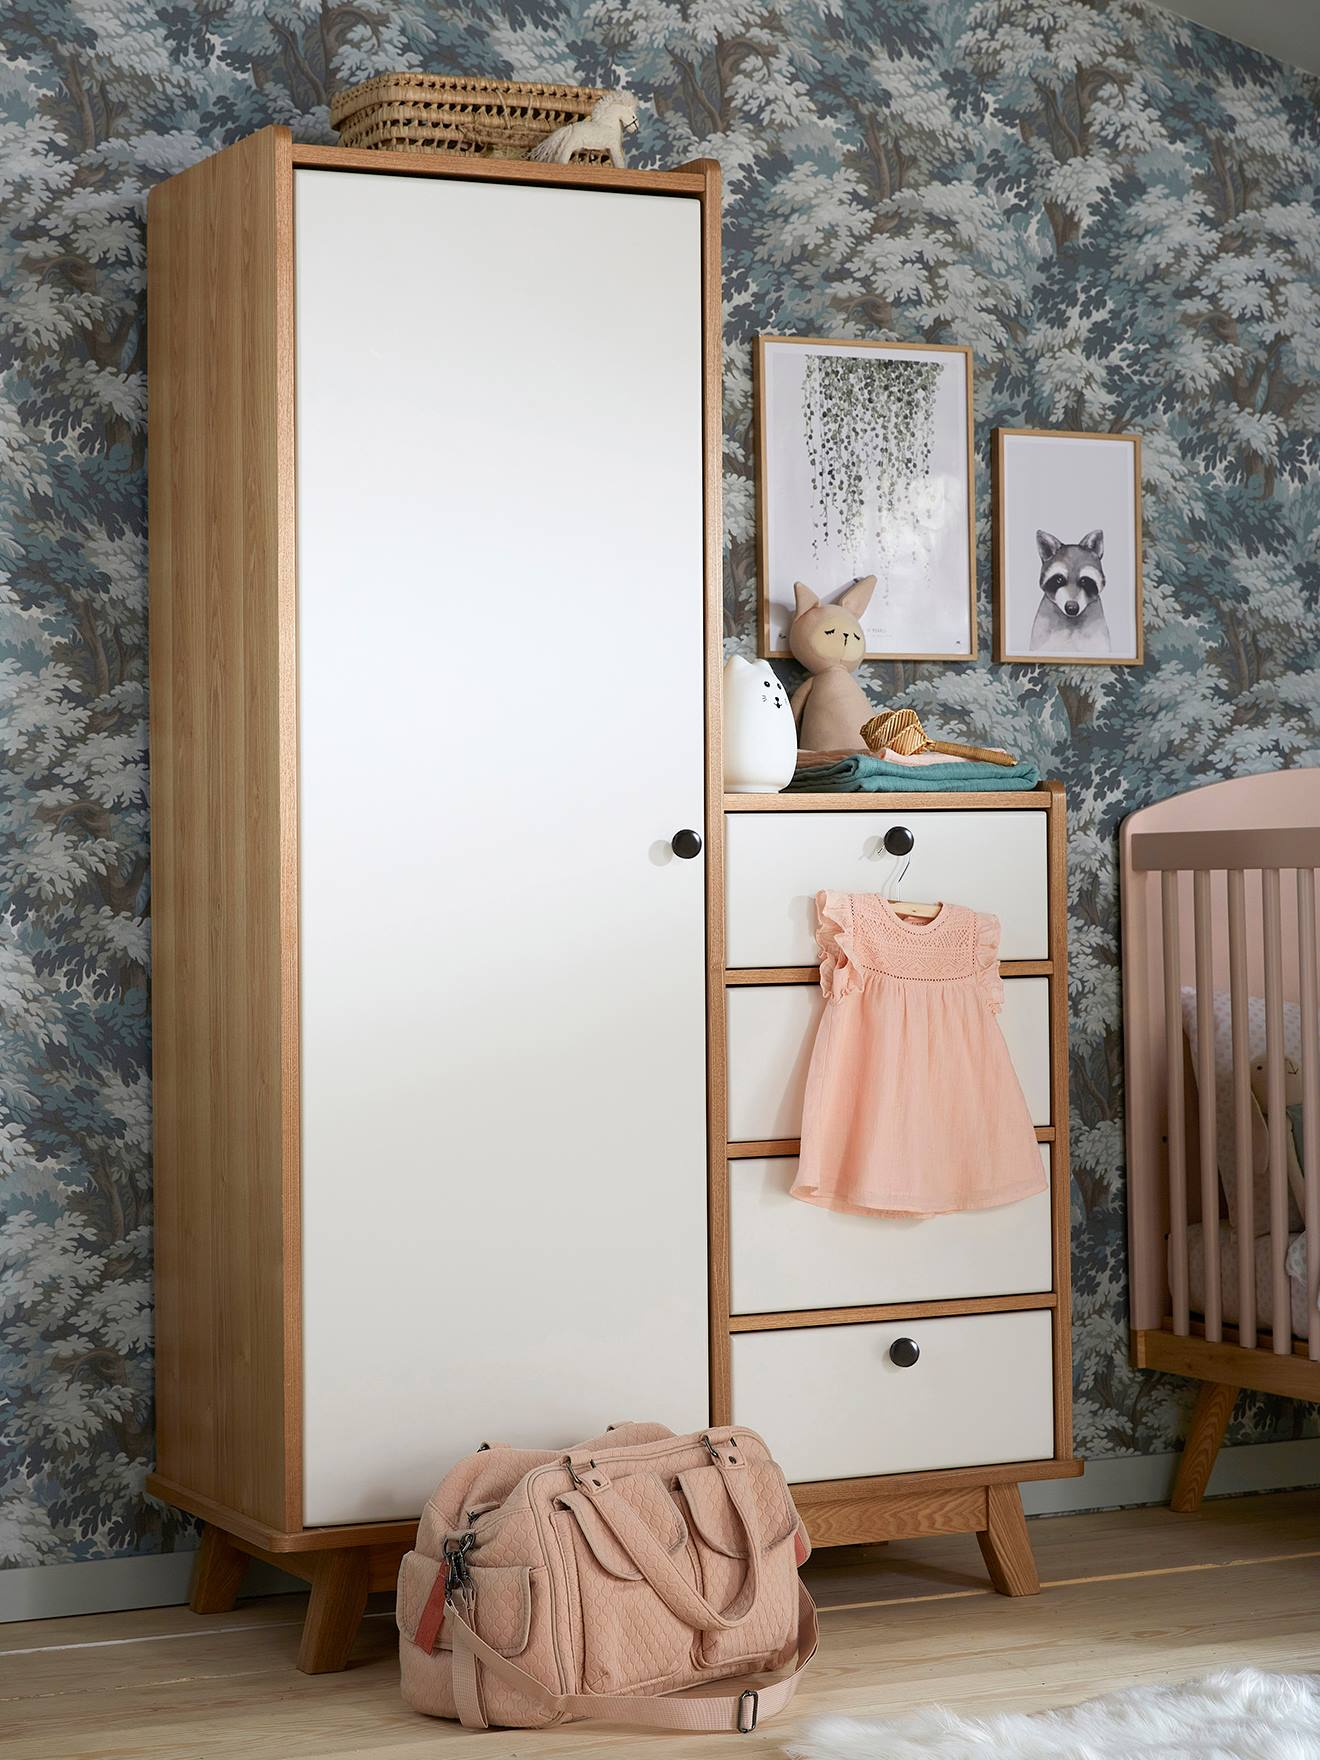 armoire vintage blanc bois